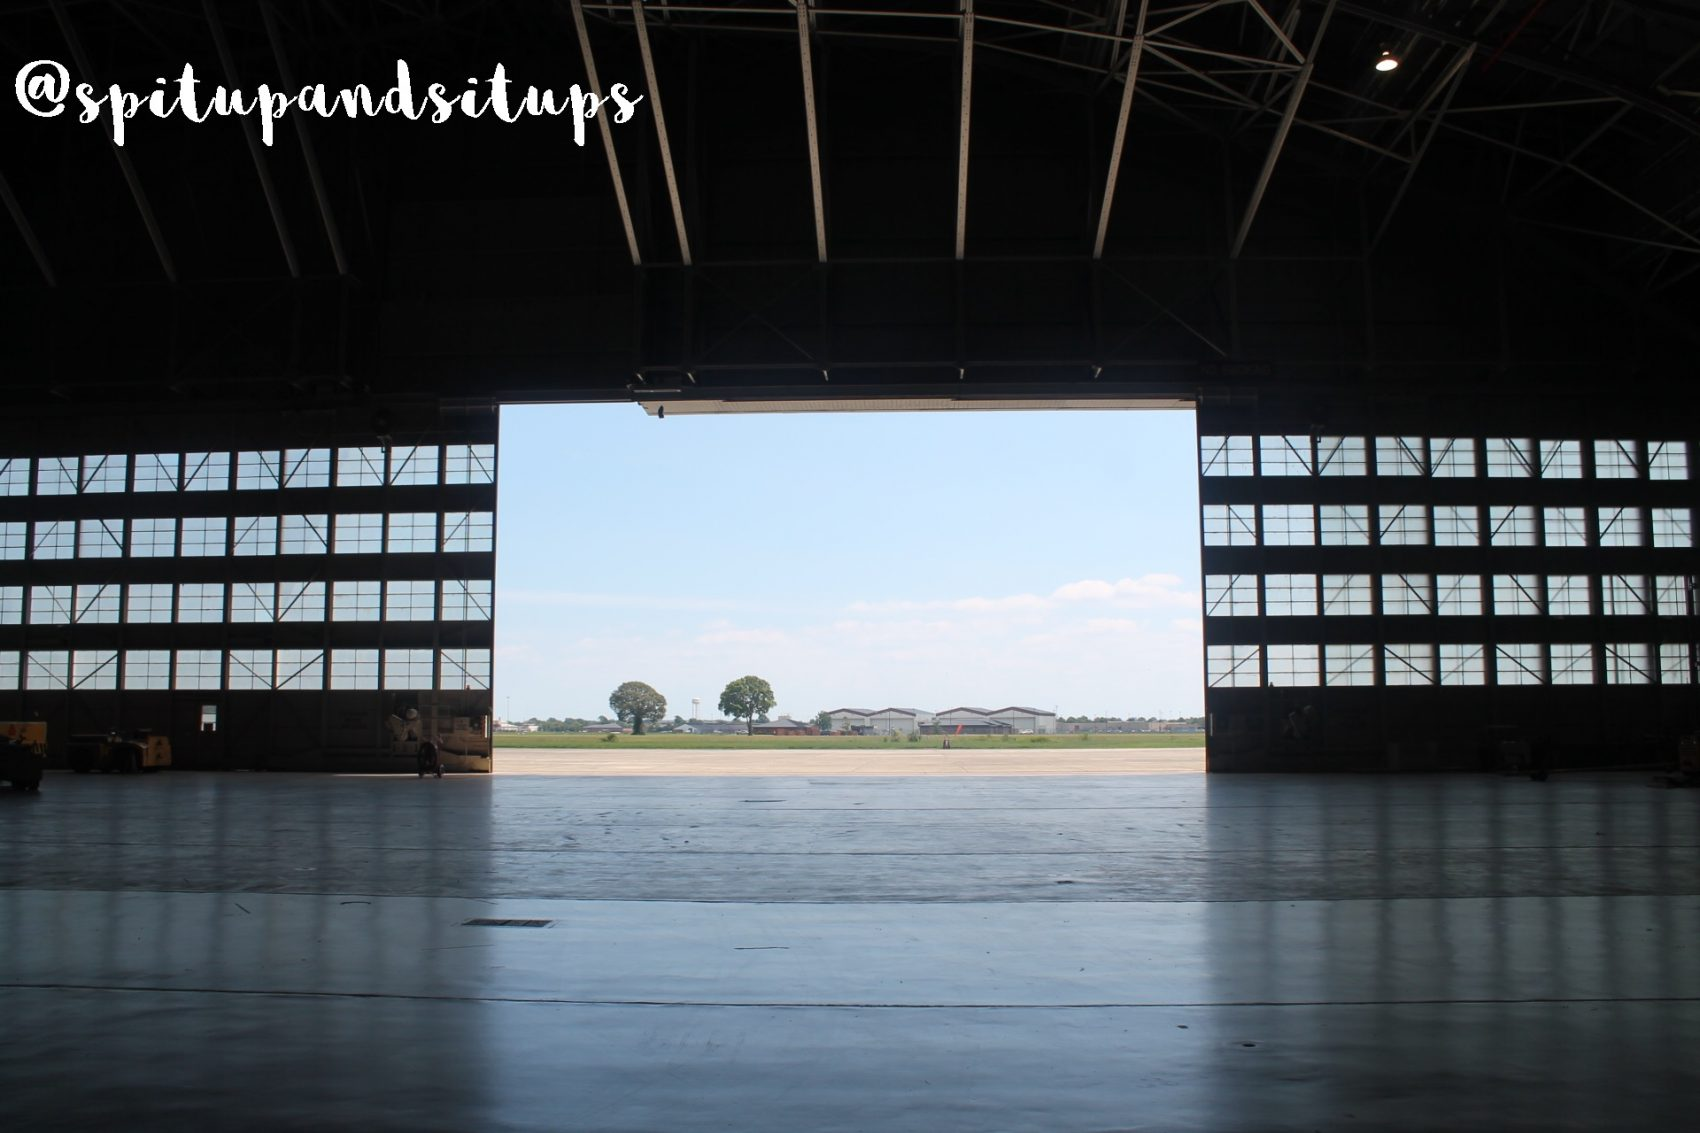 Langley Research Center Hangar View